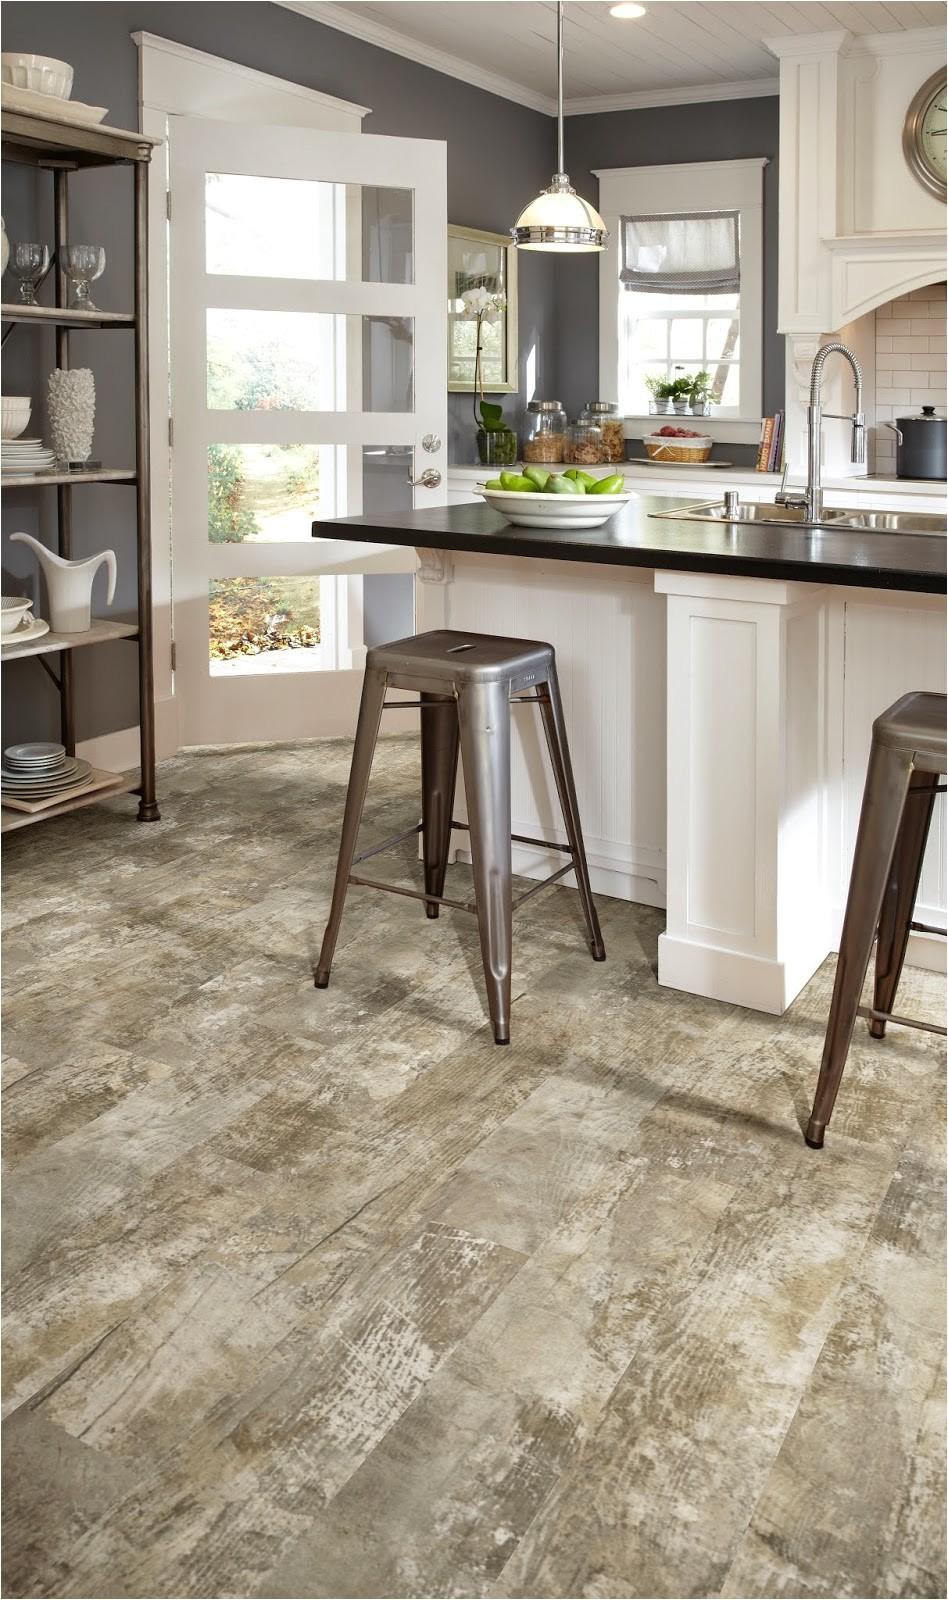 house marvelous karndean vinyl plank reviews 28 luxury flooring review invincible other rug adura of